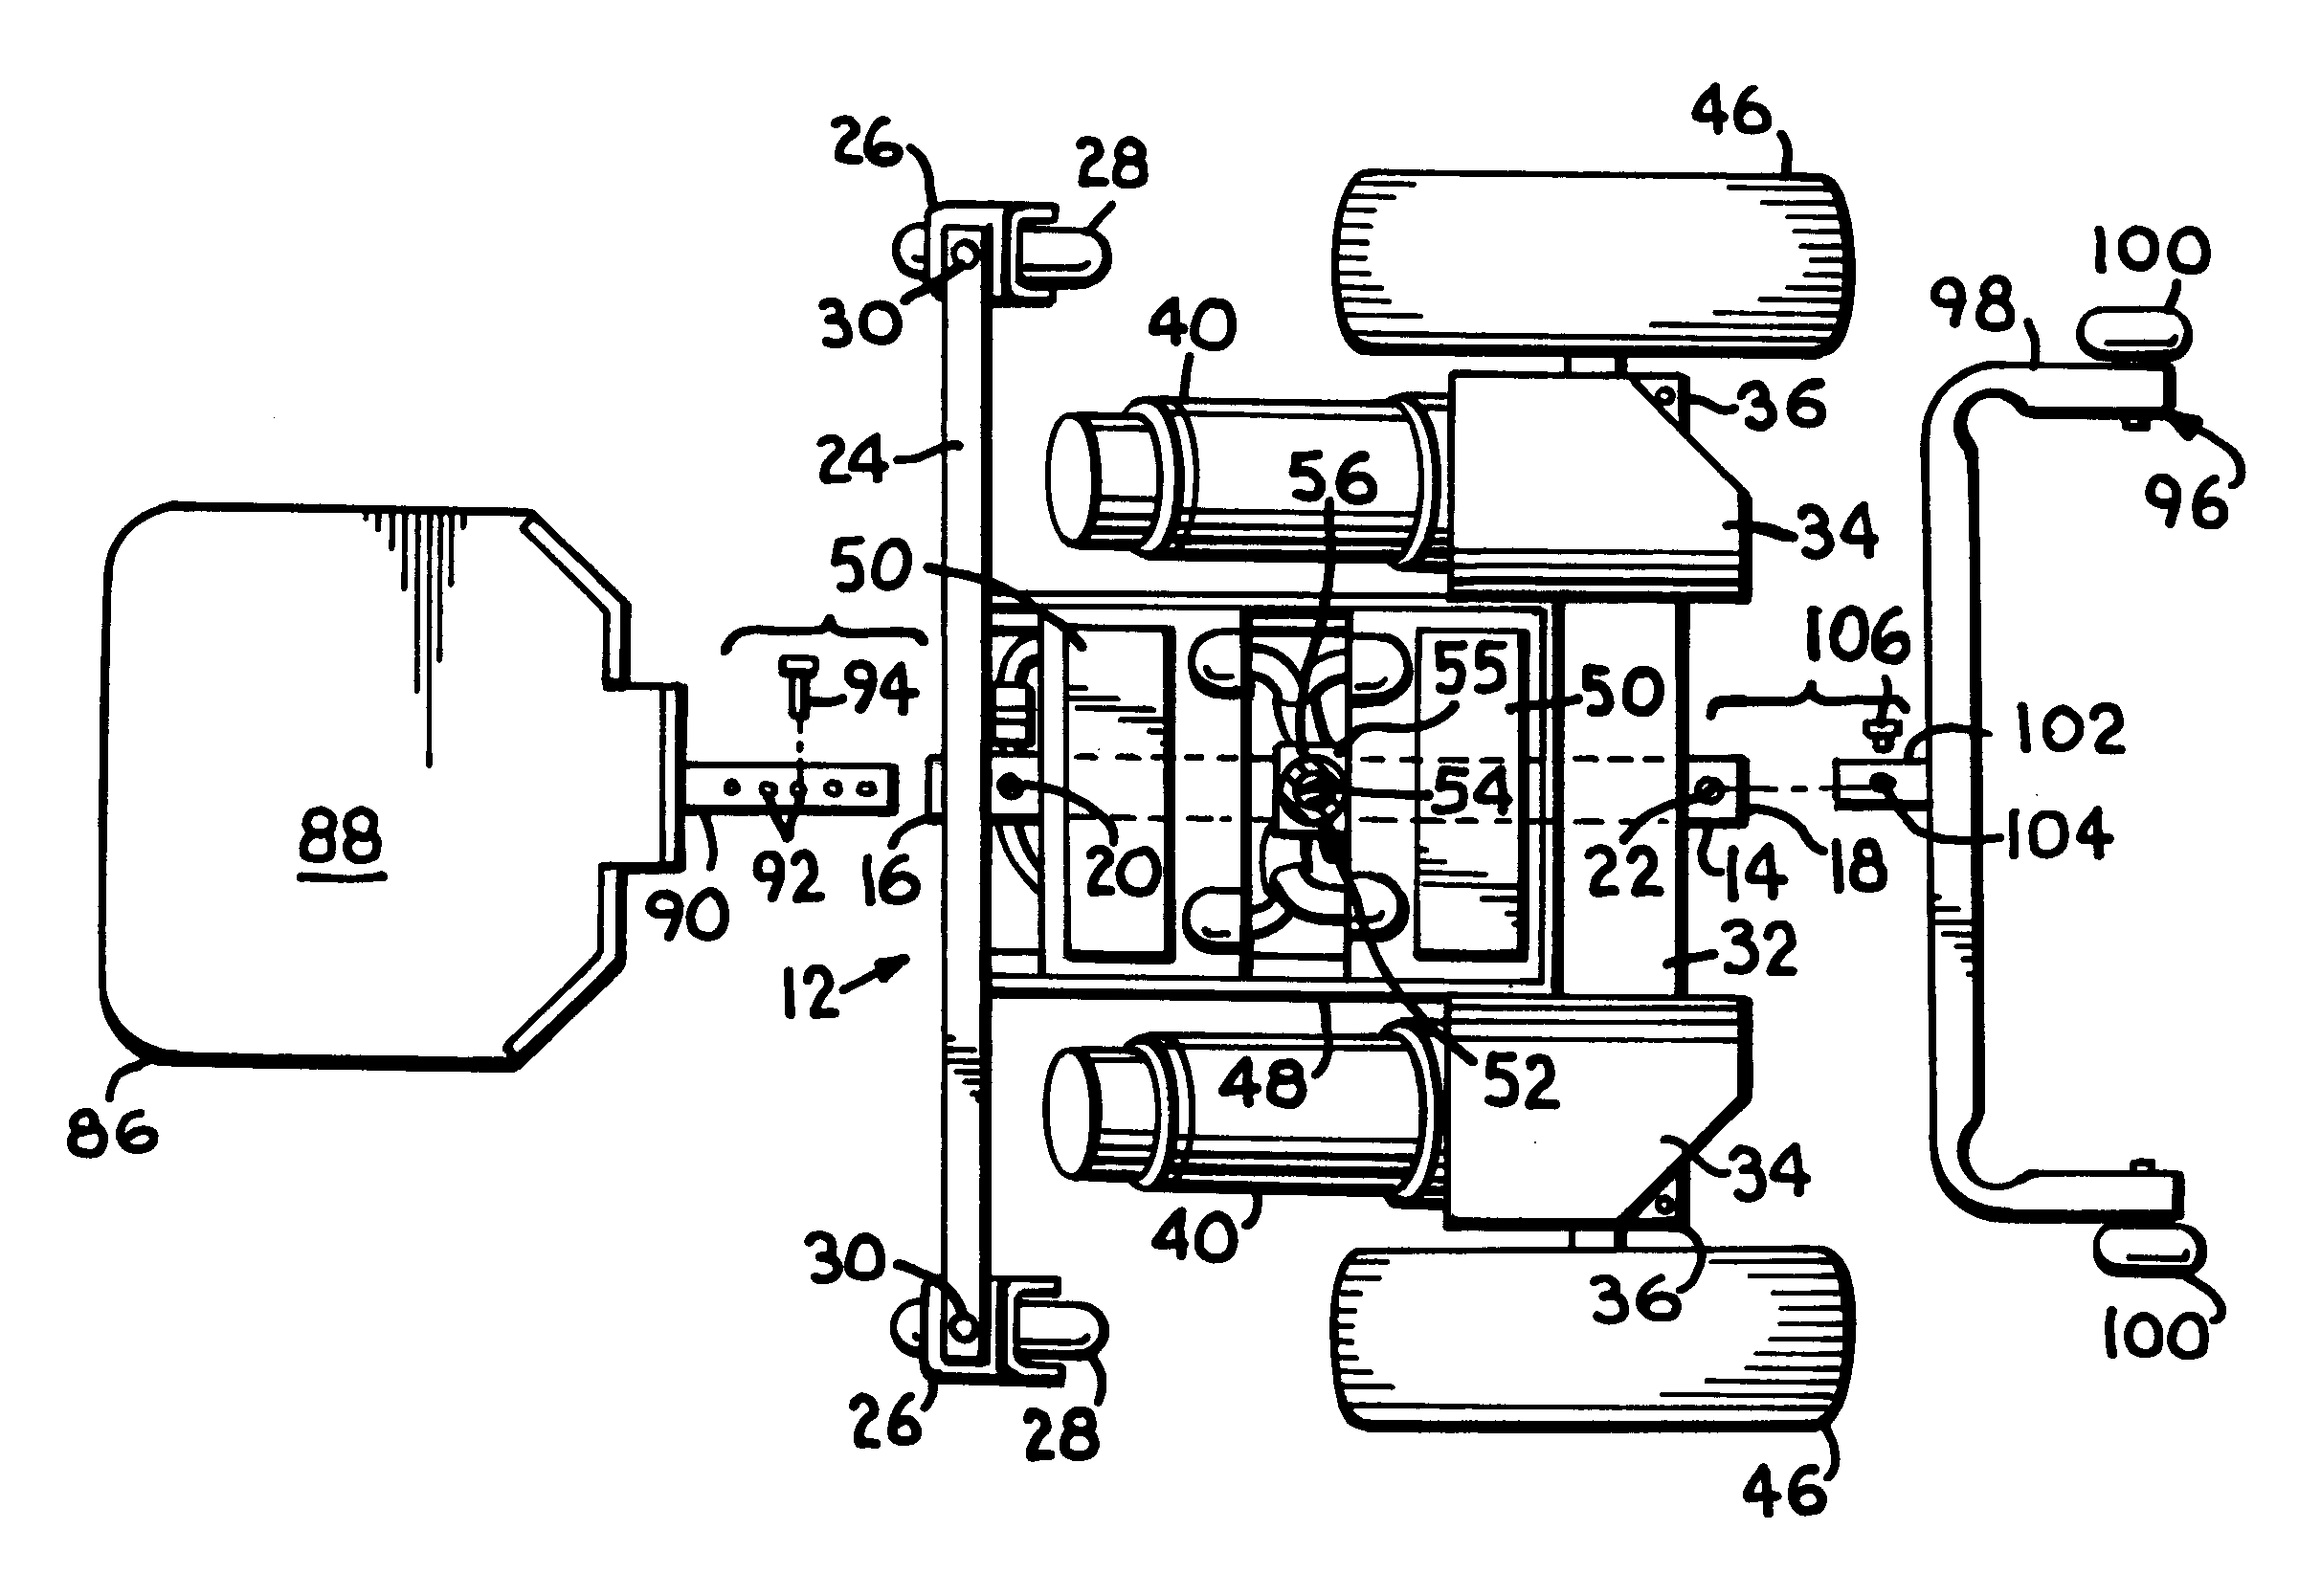 Okin Lift Chair Wiring Diagram Gallery Wiring Diagram Sample